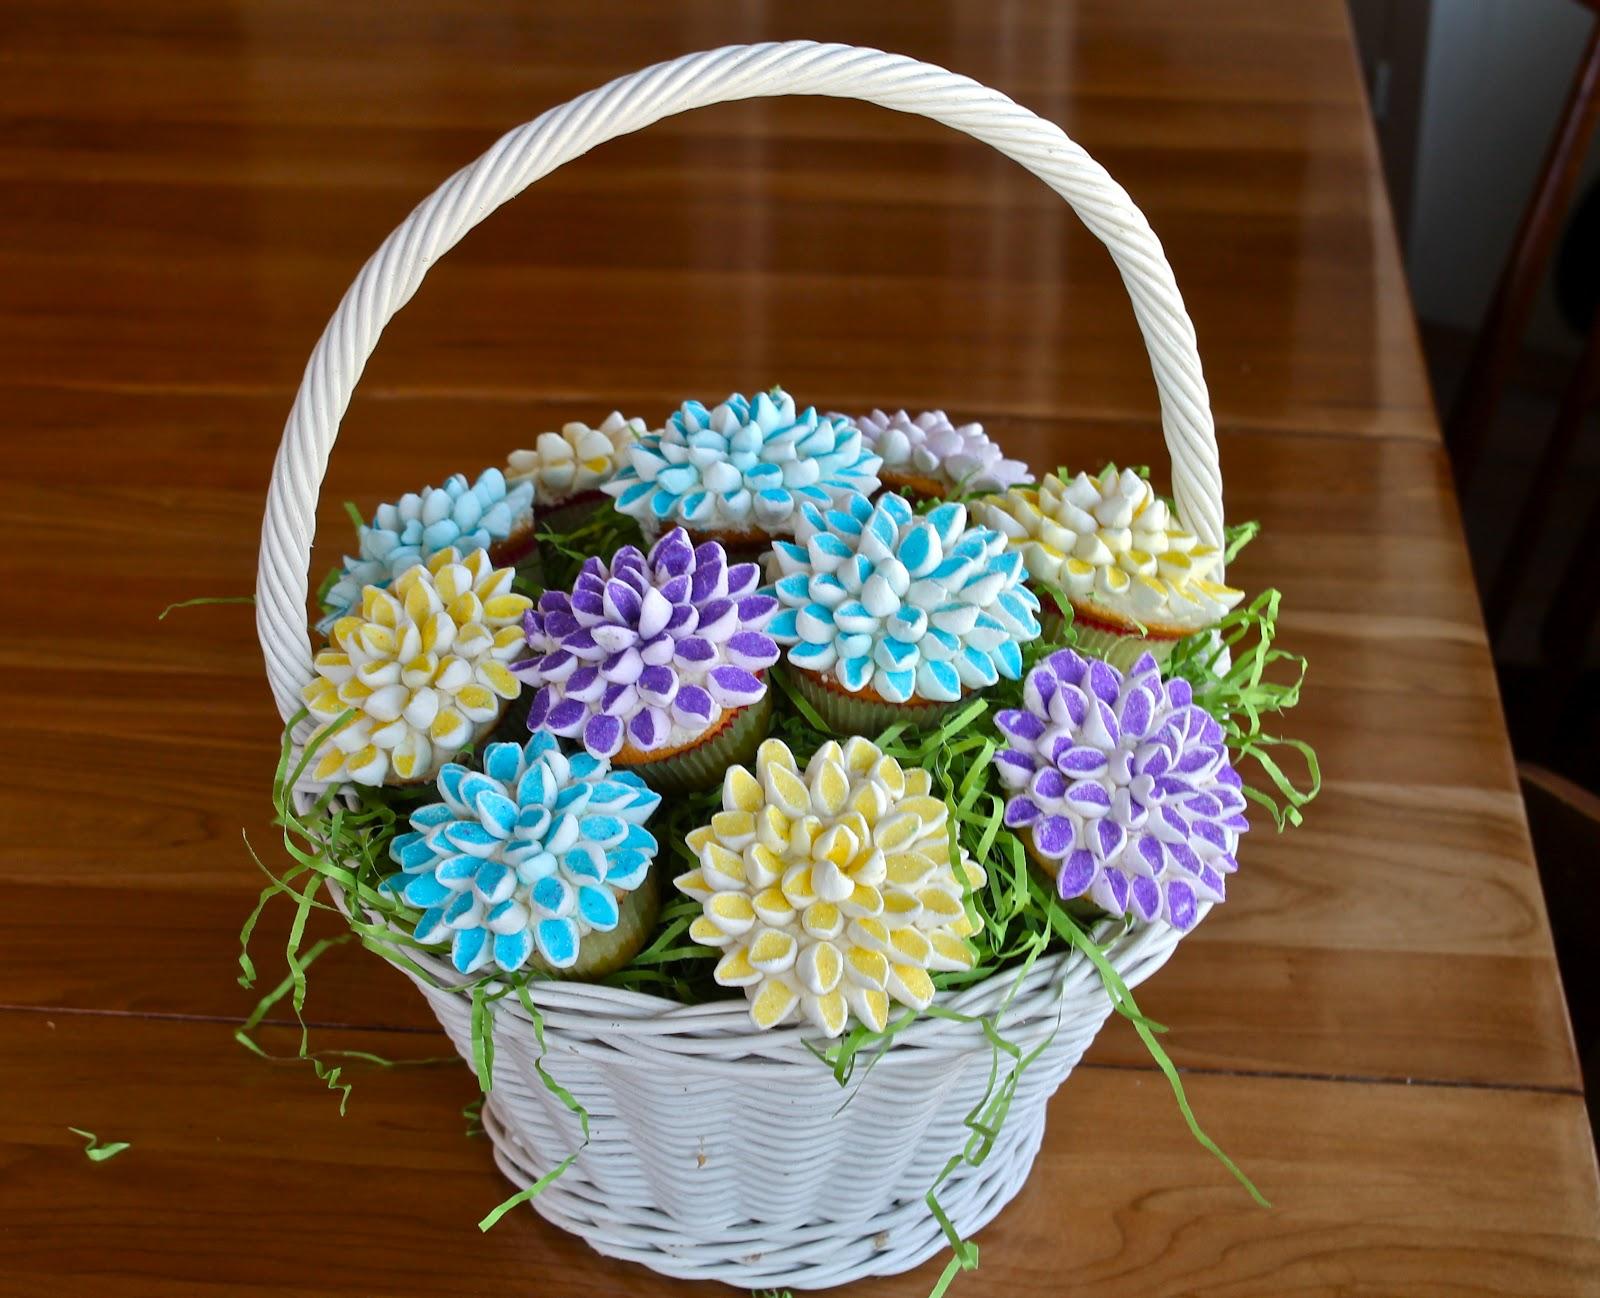 Yammies Noshery Marshmallow Flower Cupcakes